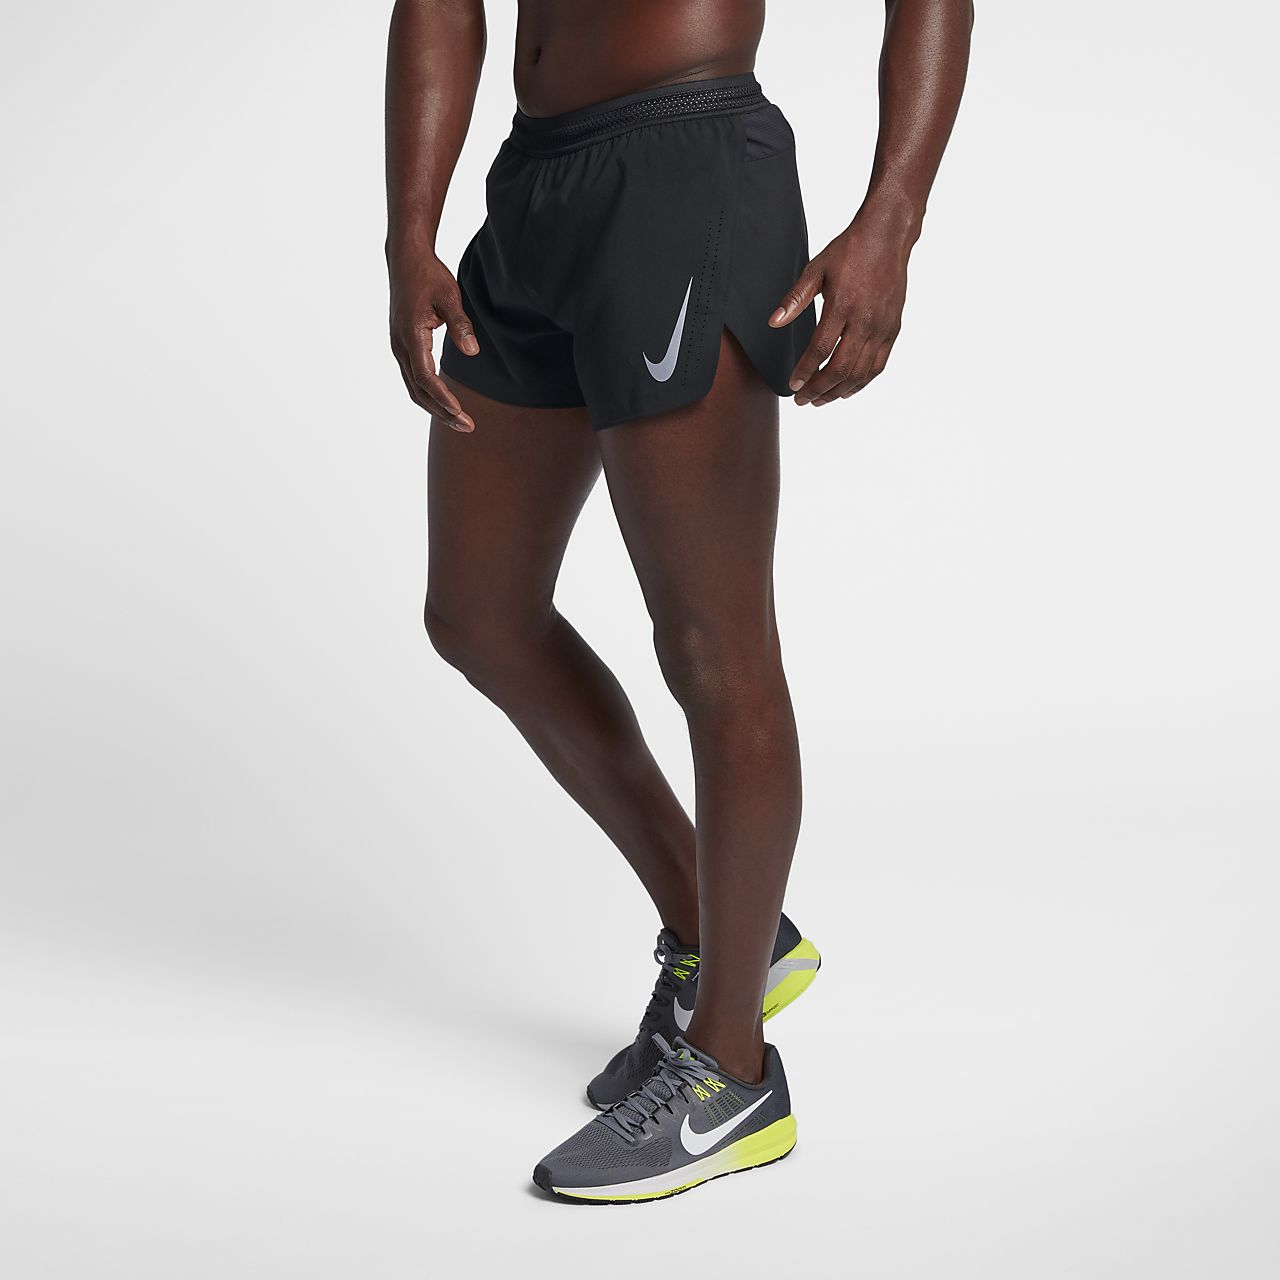 ab9fe159737 Low Resolution Nike VaporKnit Men s 4